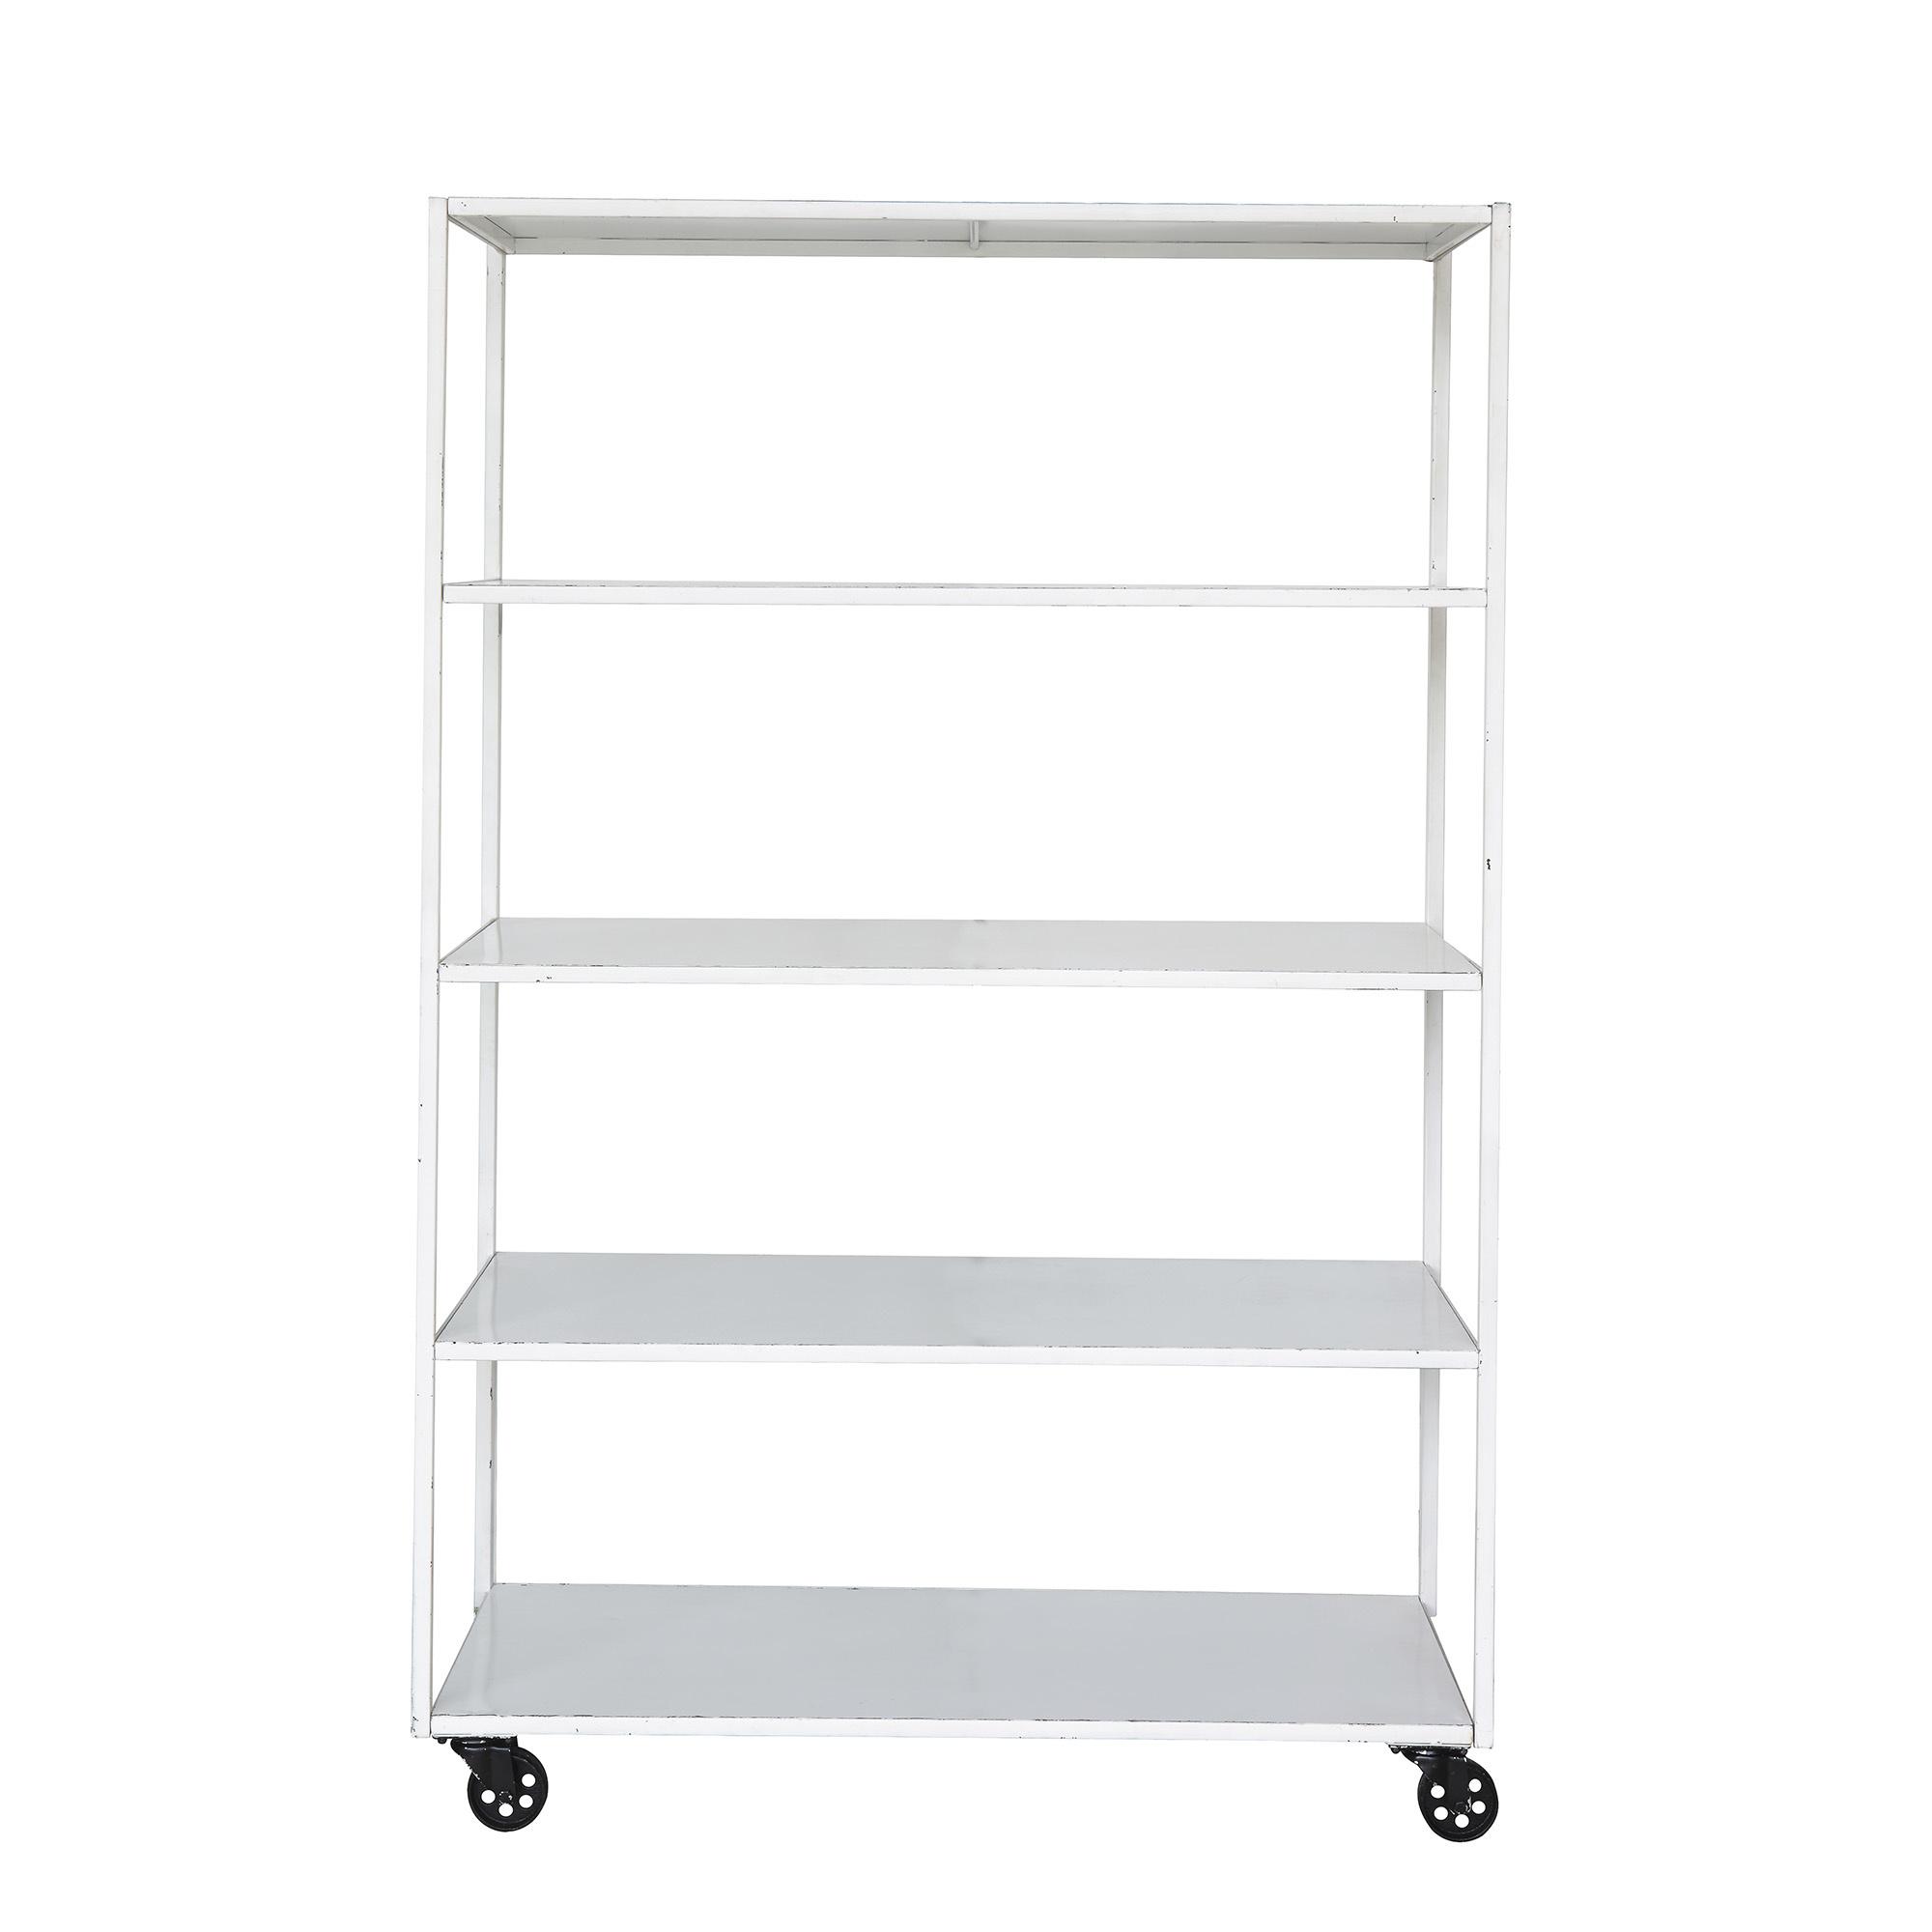 Bloomingville Industrial shelf on wheels - White - L120xH184xW45,5cm - Bloomingville